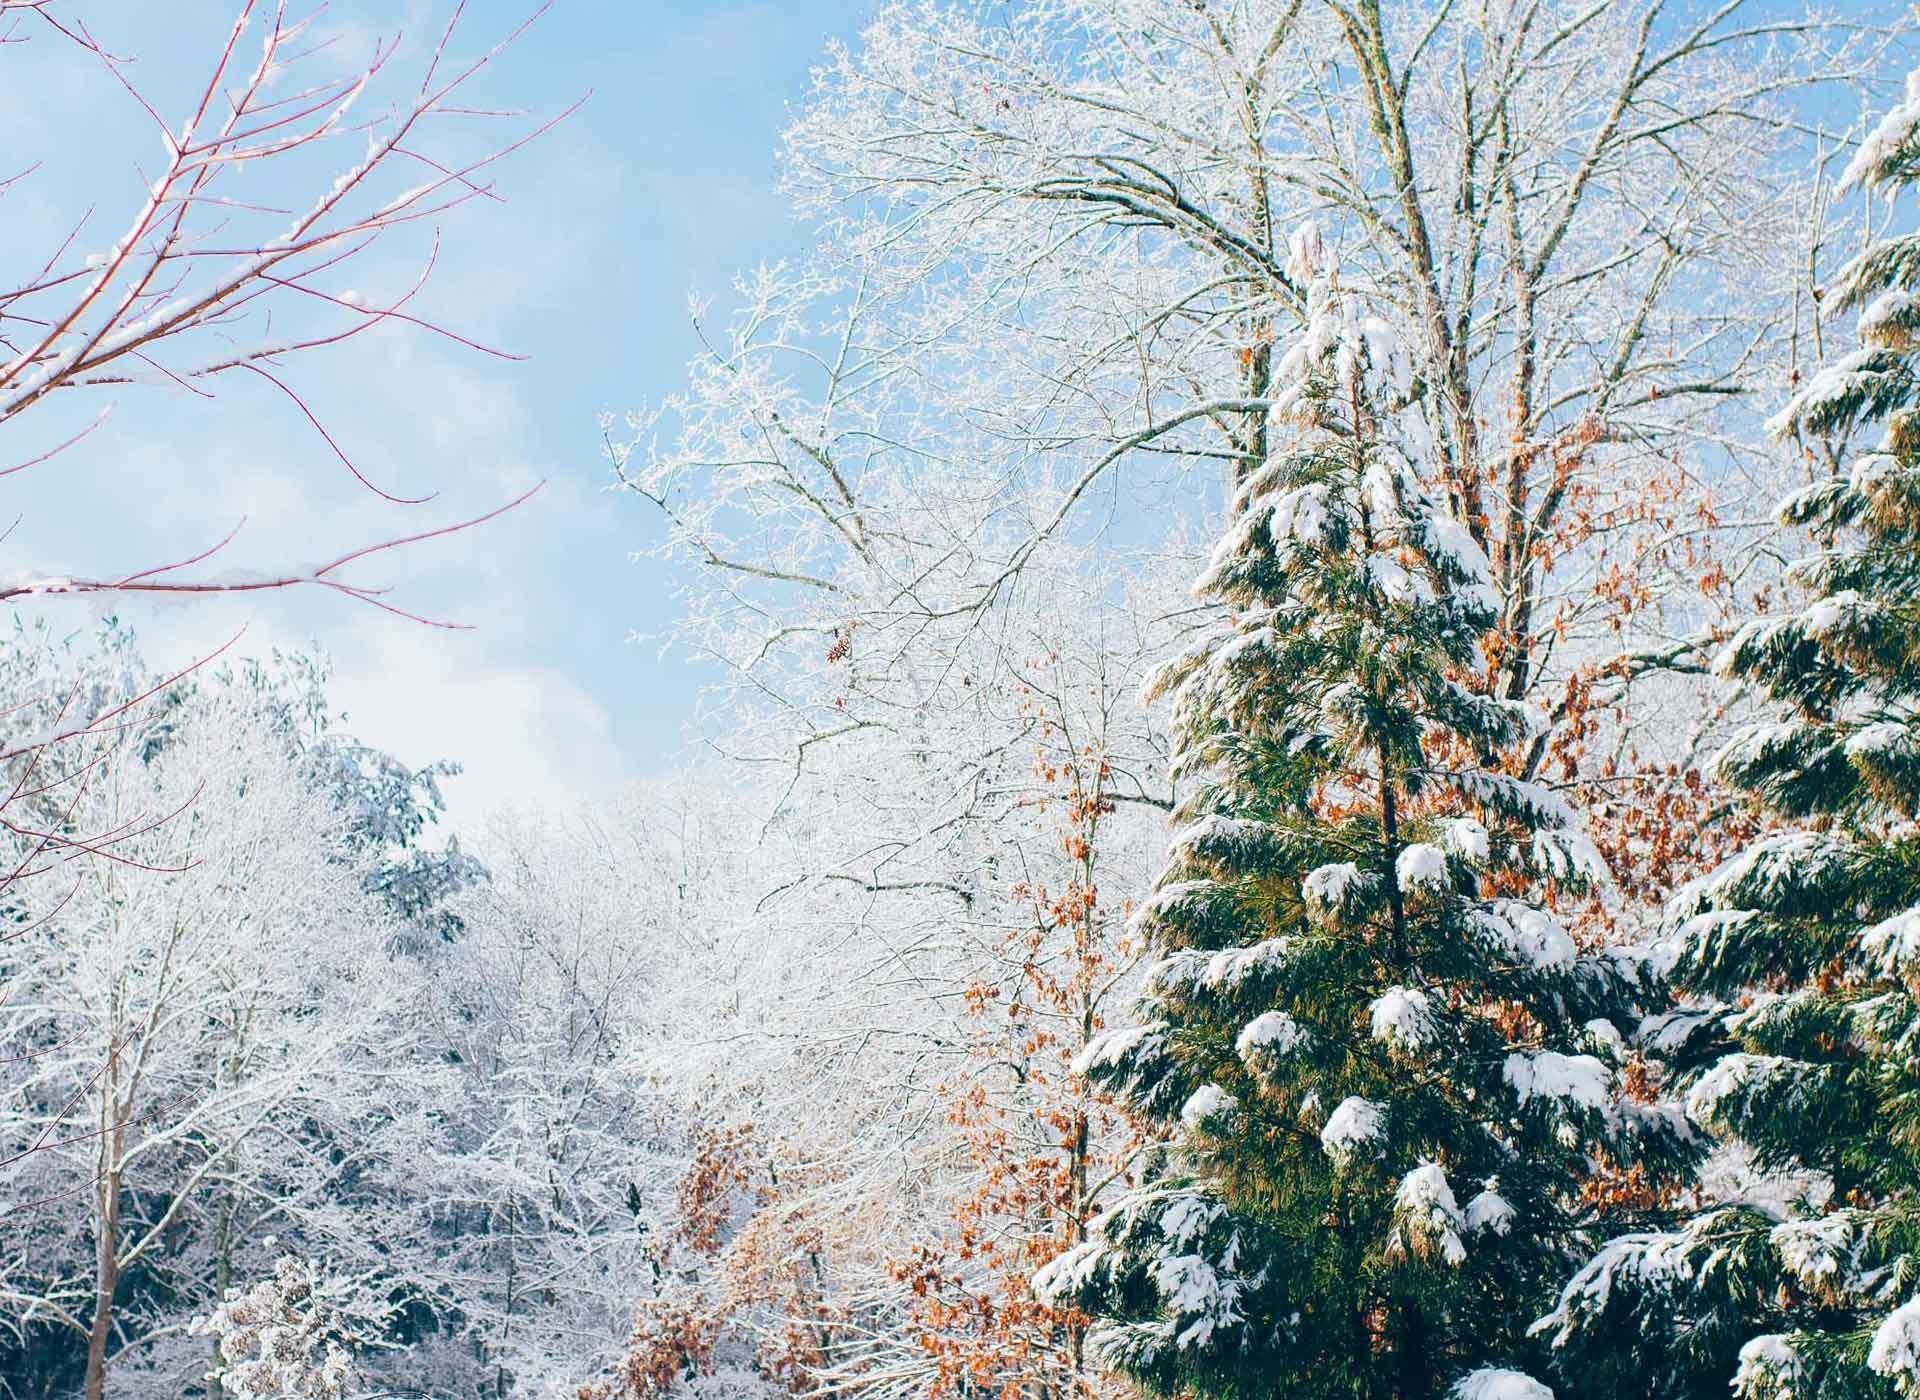 Full Screen Wallpaper of a colourful snow scene